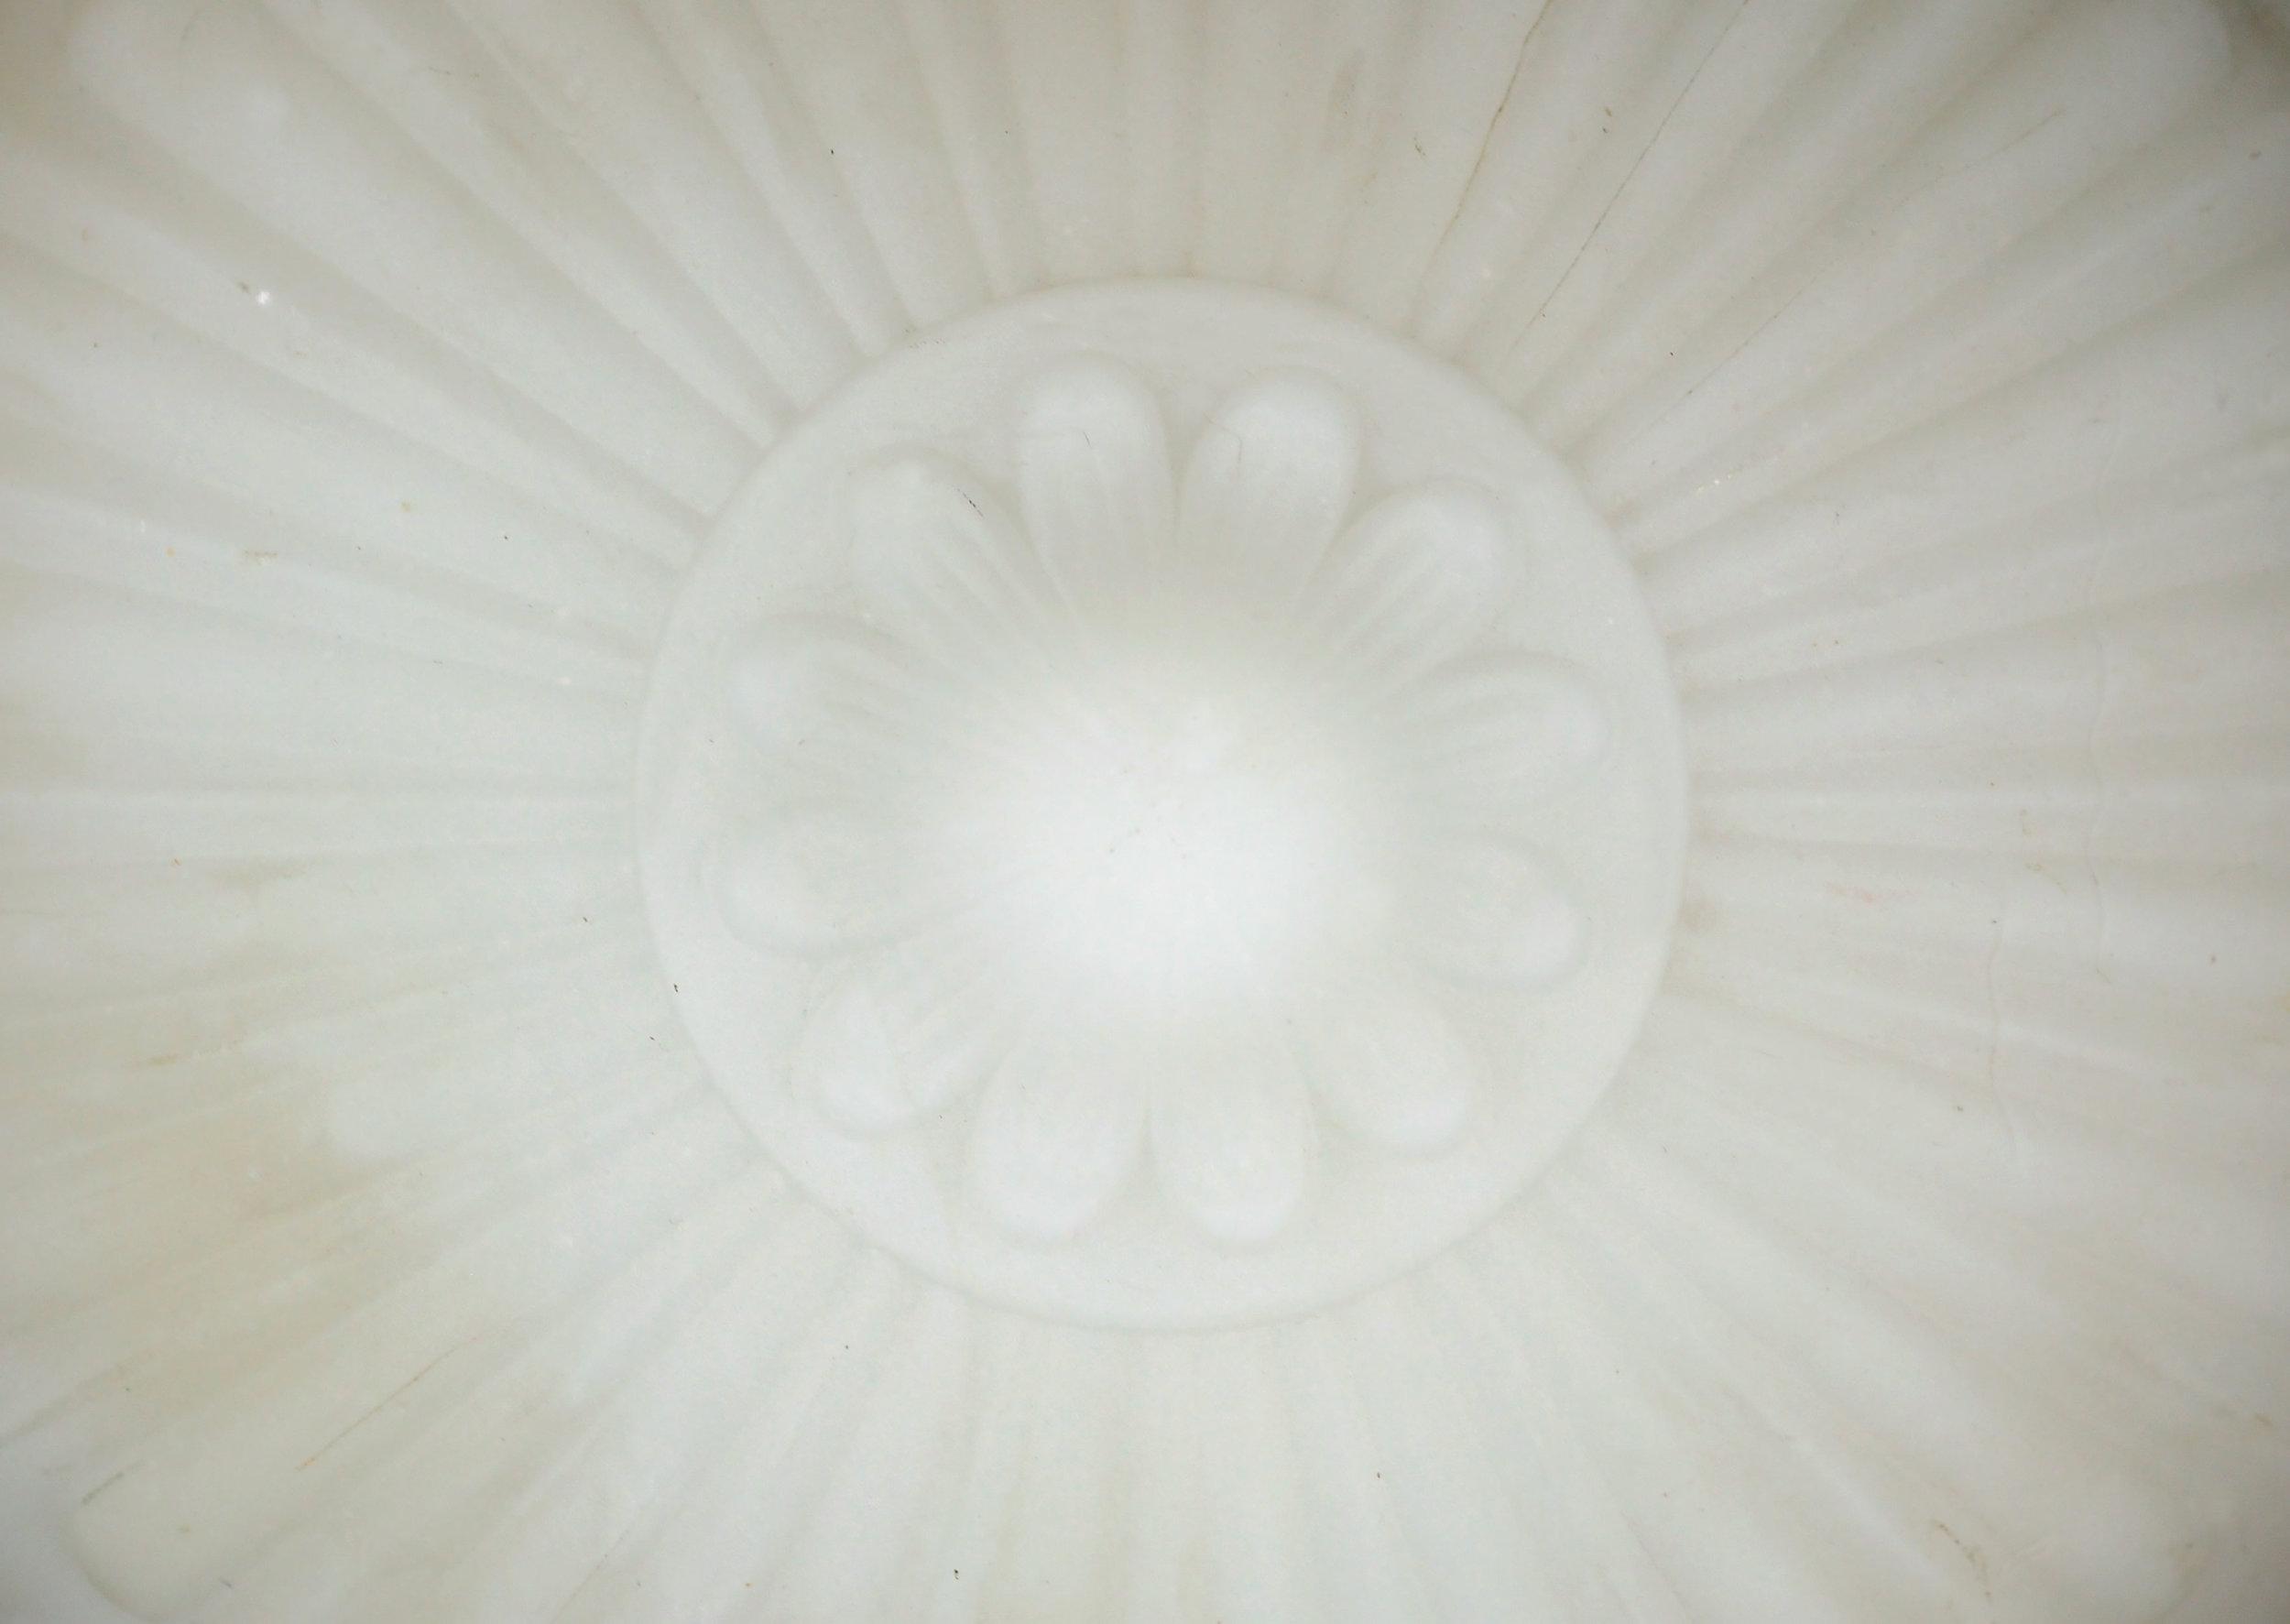 47150-bowl-chandelier-with-leaves-bottom-detail.jpg